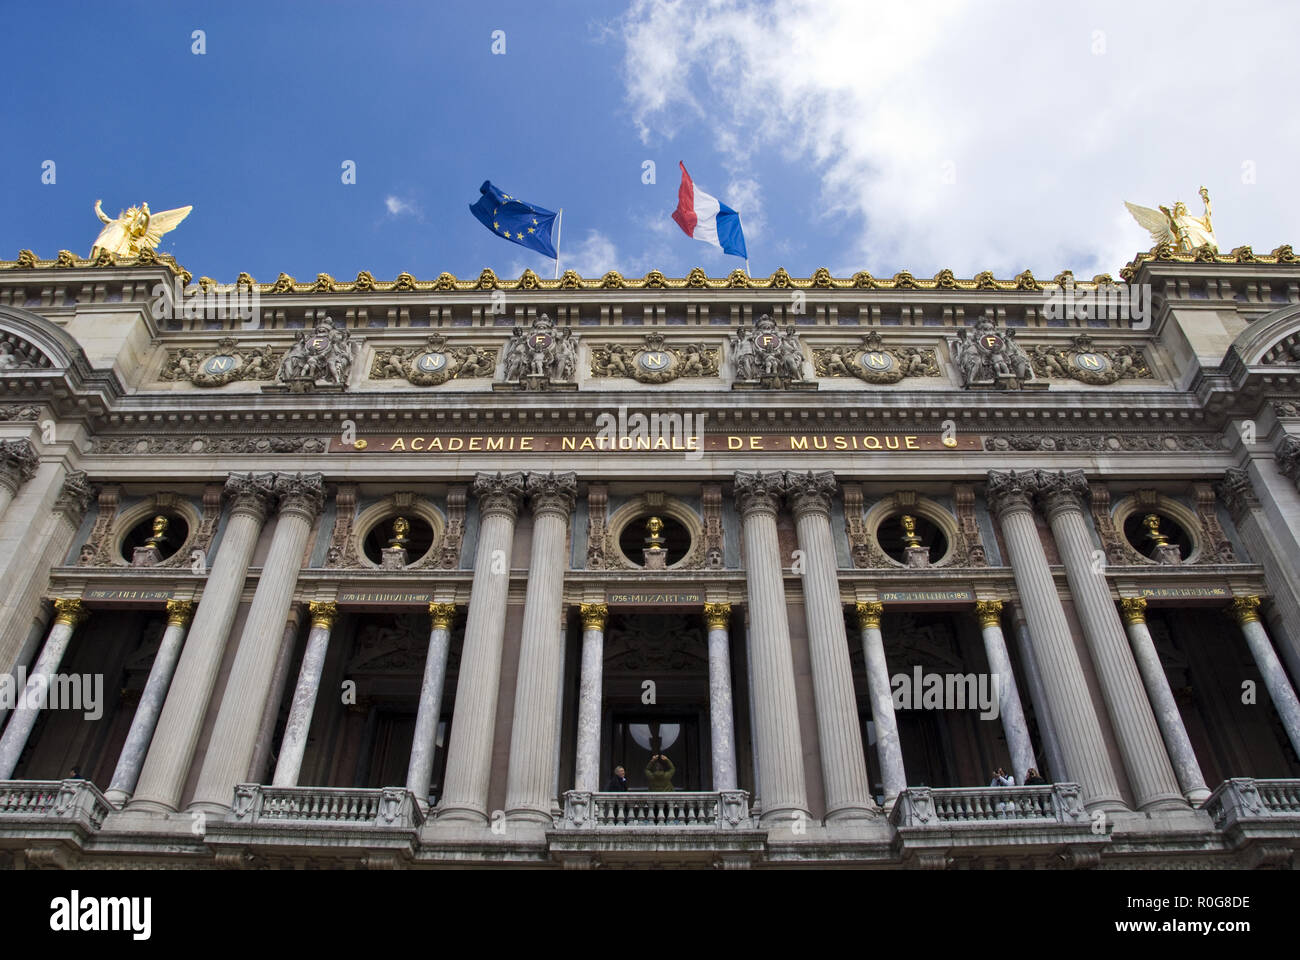 "The Palais Garnier (Garnier Palace) opera house, famous as the setting for Gaston Leroux's 1910 novel ""The Phantom of the Opera,"" Paris, France. Stock Photo"